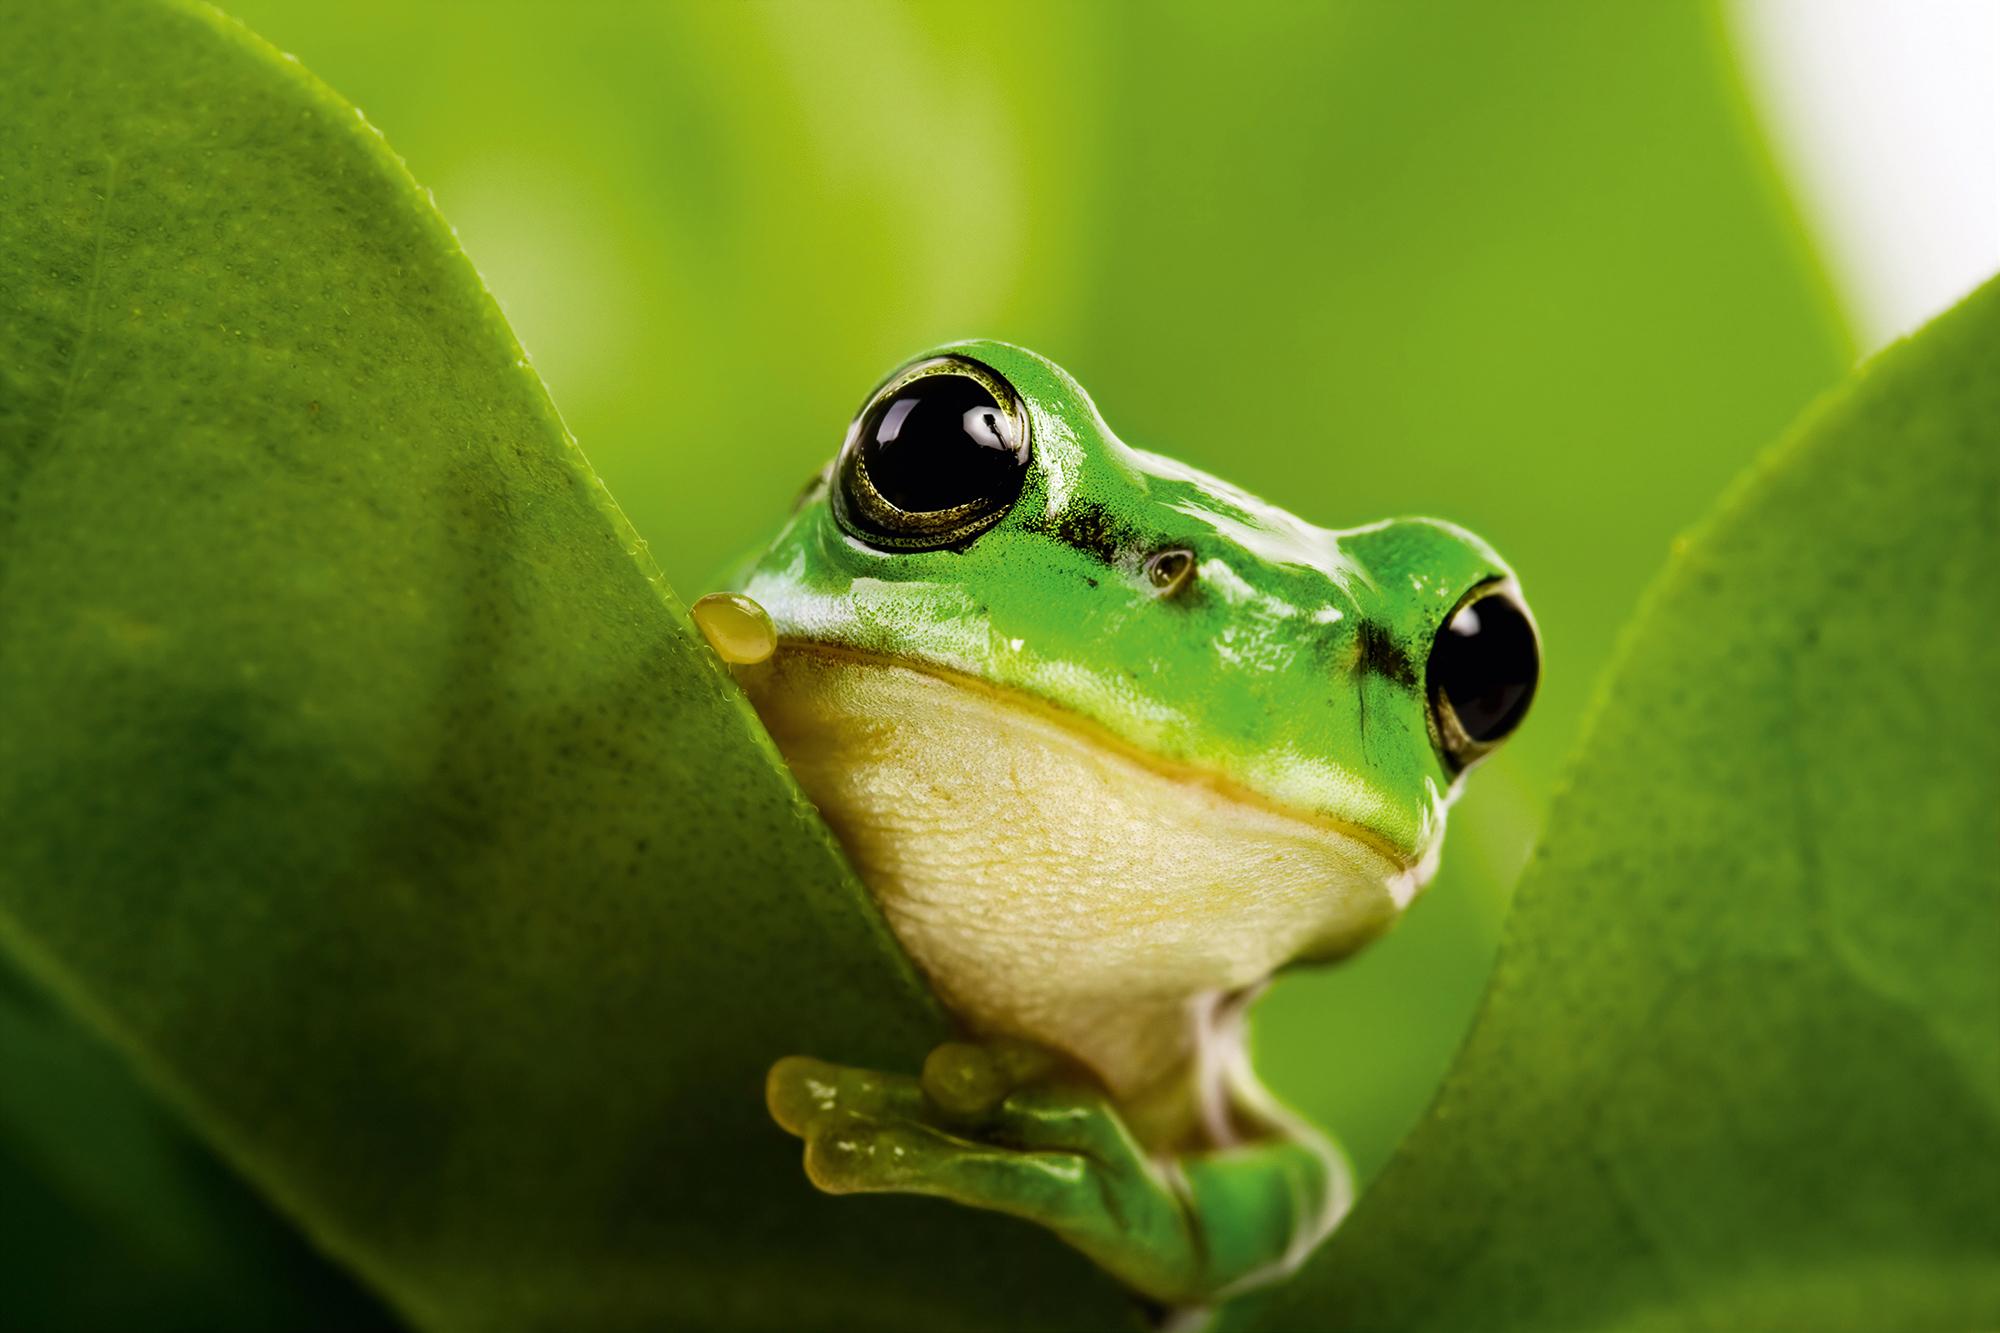 Grüner Frosch schaut zwischen grünen Blättern heraus.